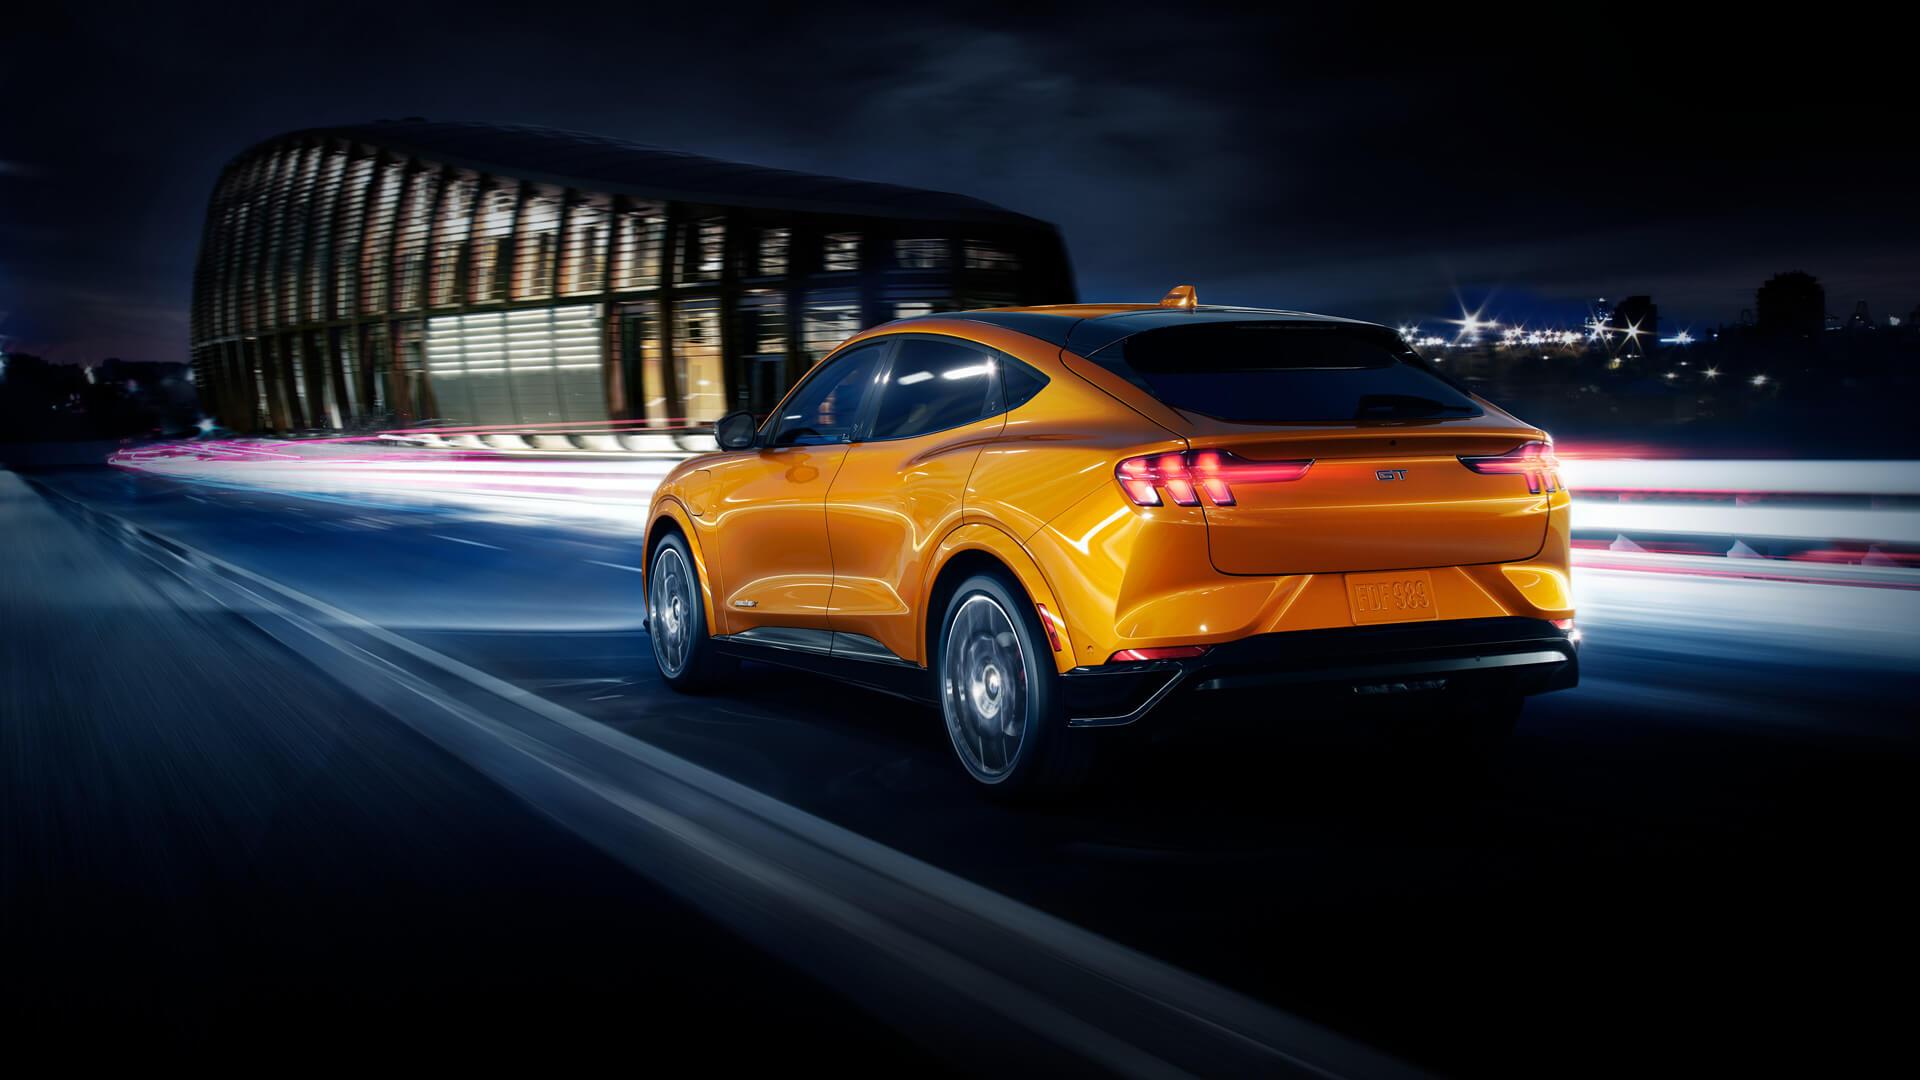 Ford Mustang Mach-E получит культовый для модели цвет